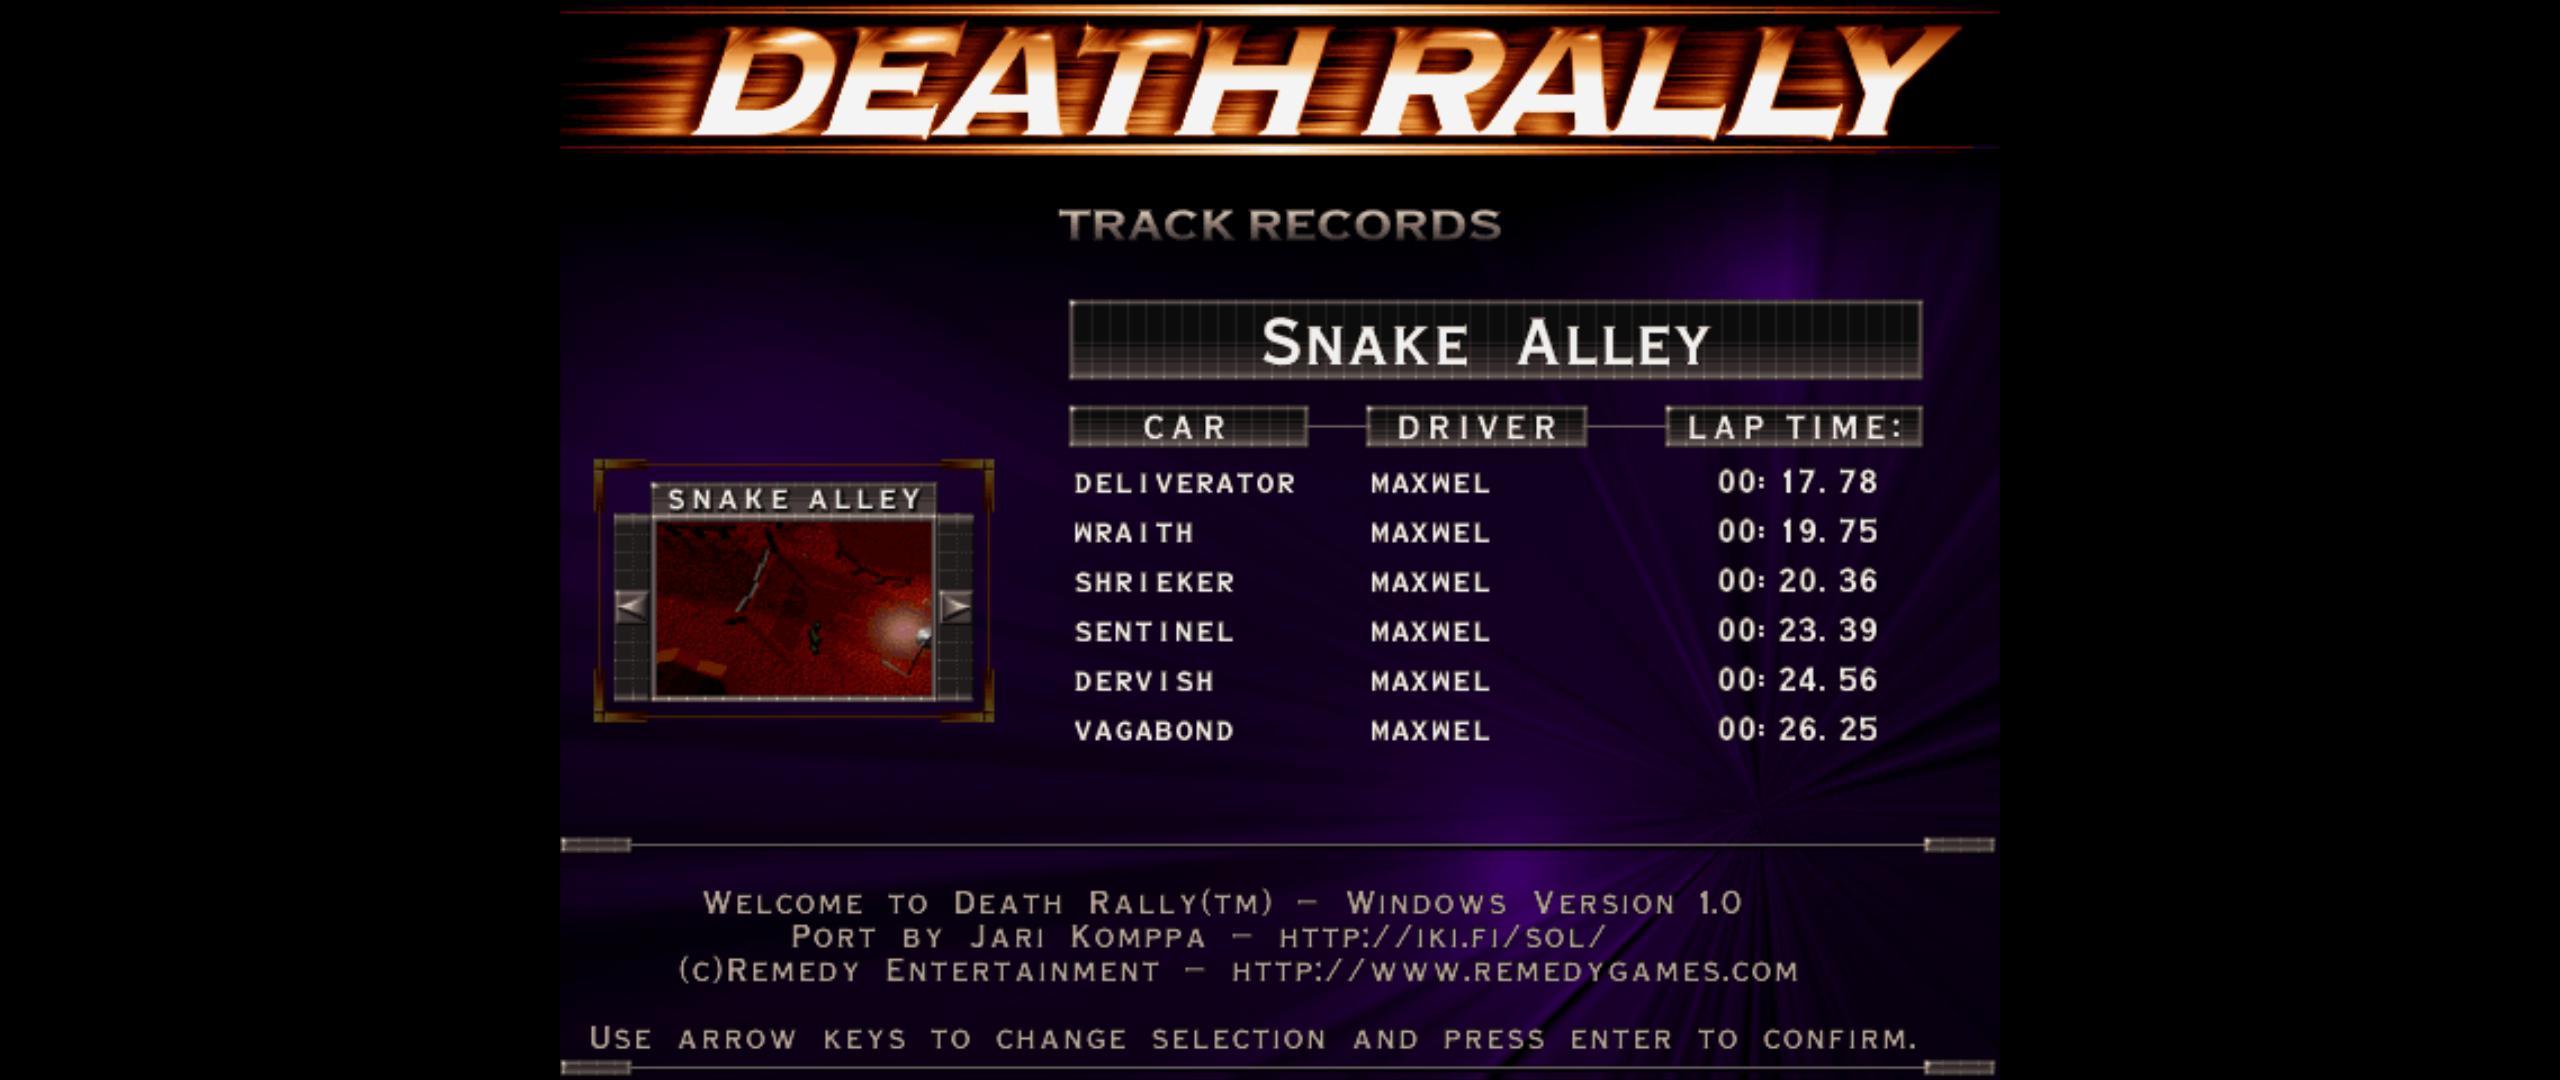 Maxwel: Death Rally [Snake Alley, Shrieker Car] (PC) 0:00:20.36 points on 2016-03-03 03:04:59